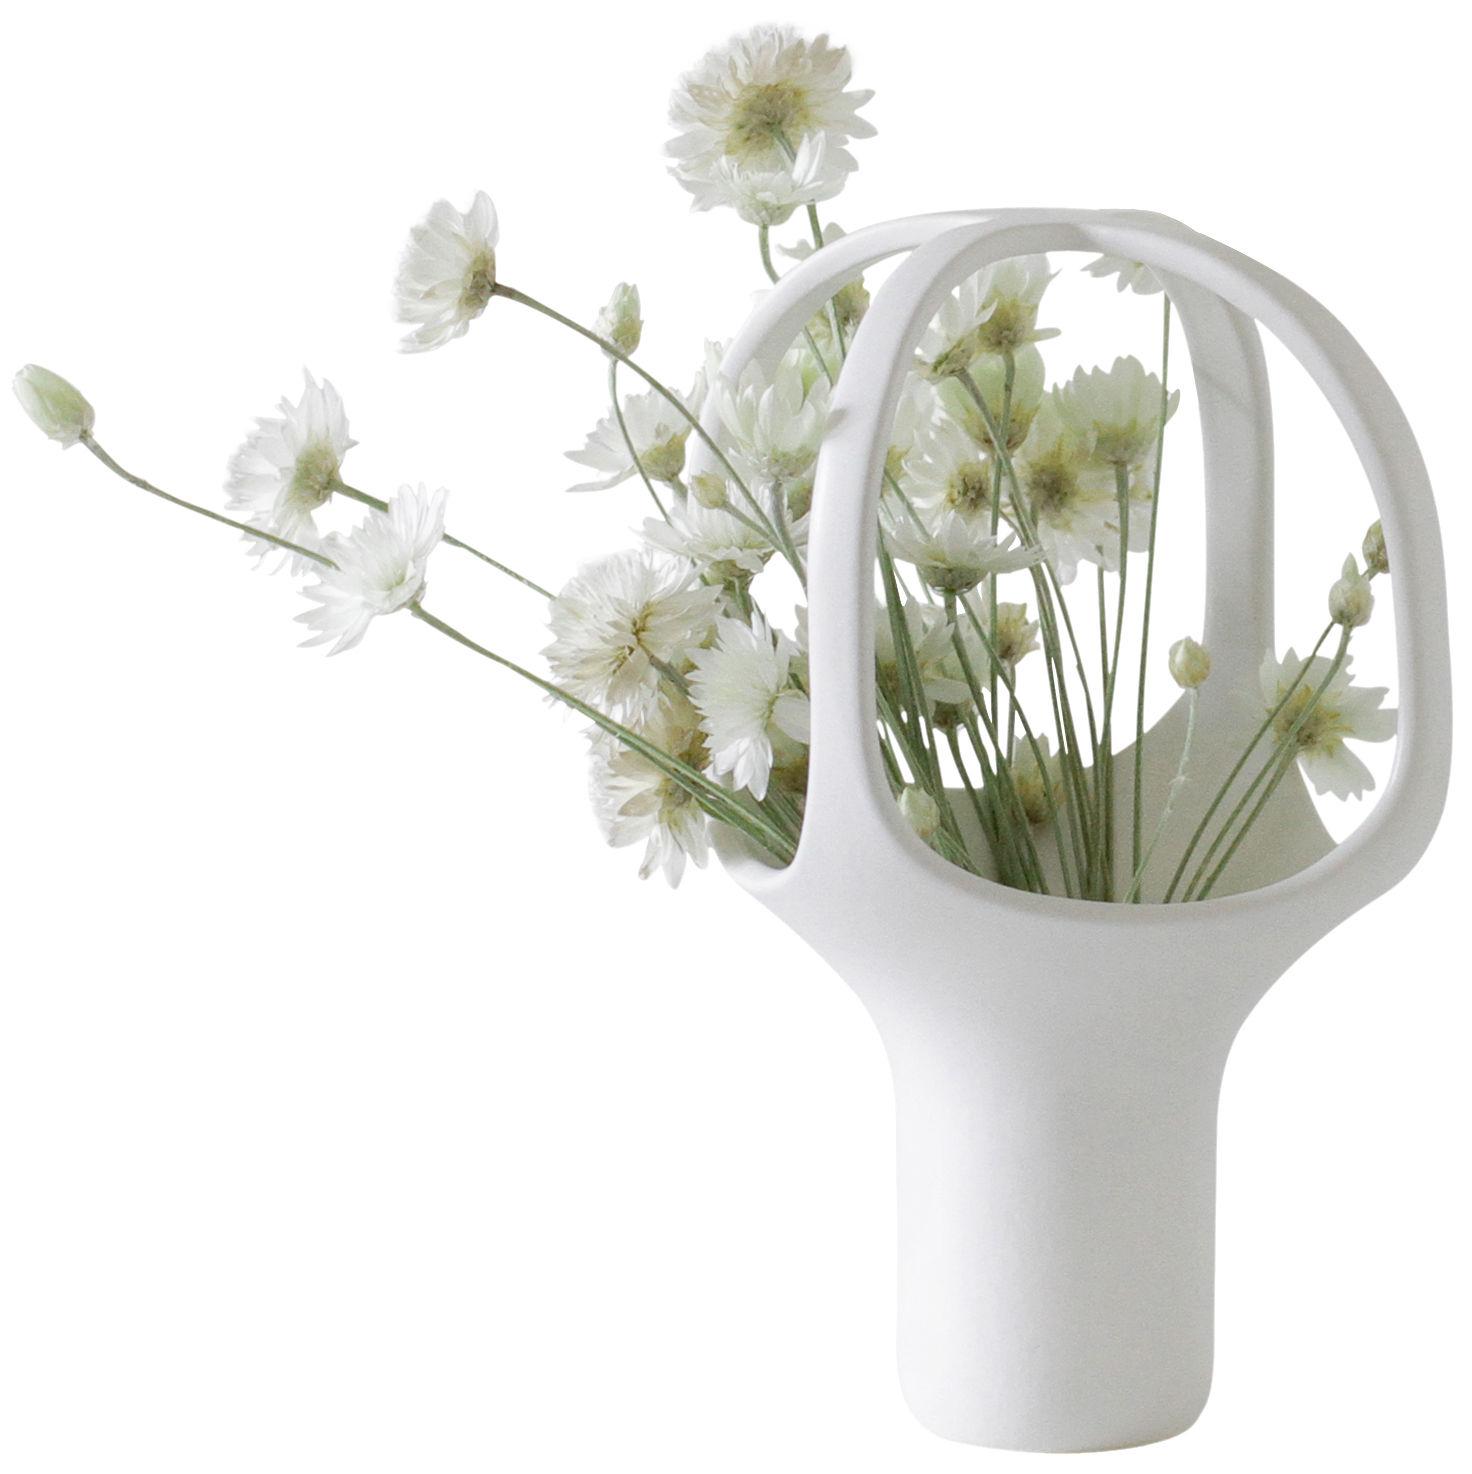 Dekoration - Vasen - Heirloom n°1 Vase / H 25 cm - Moustache - Weiß - Keramik